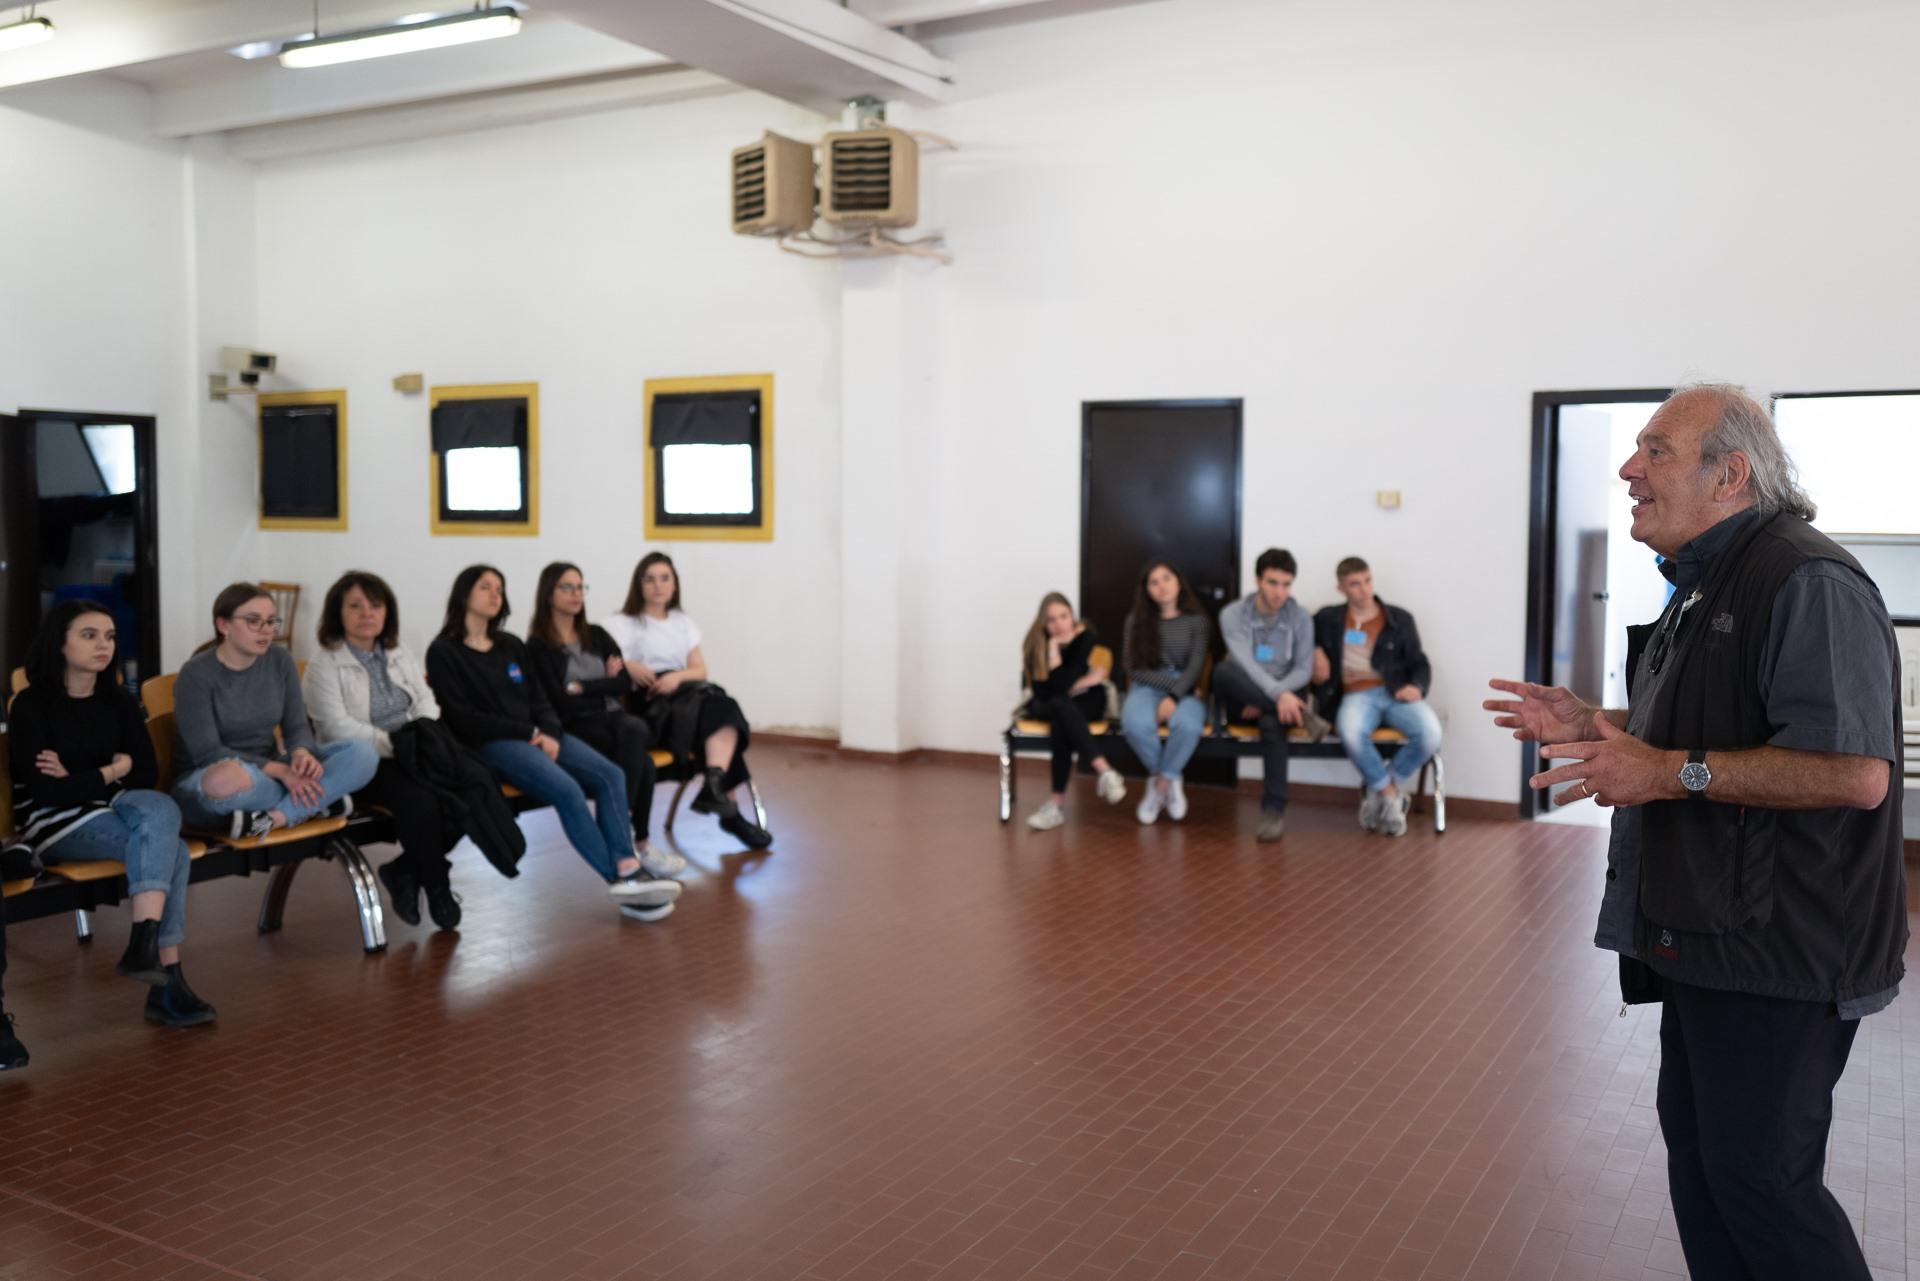 Teatro-Nucleo-prove-ph-Daniele-Mantovani